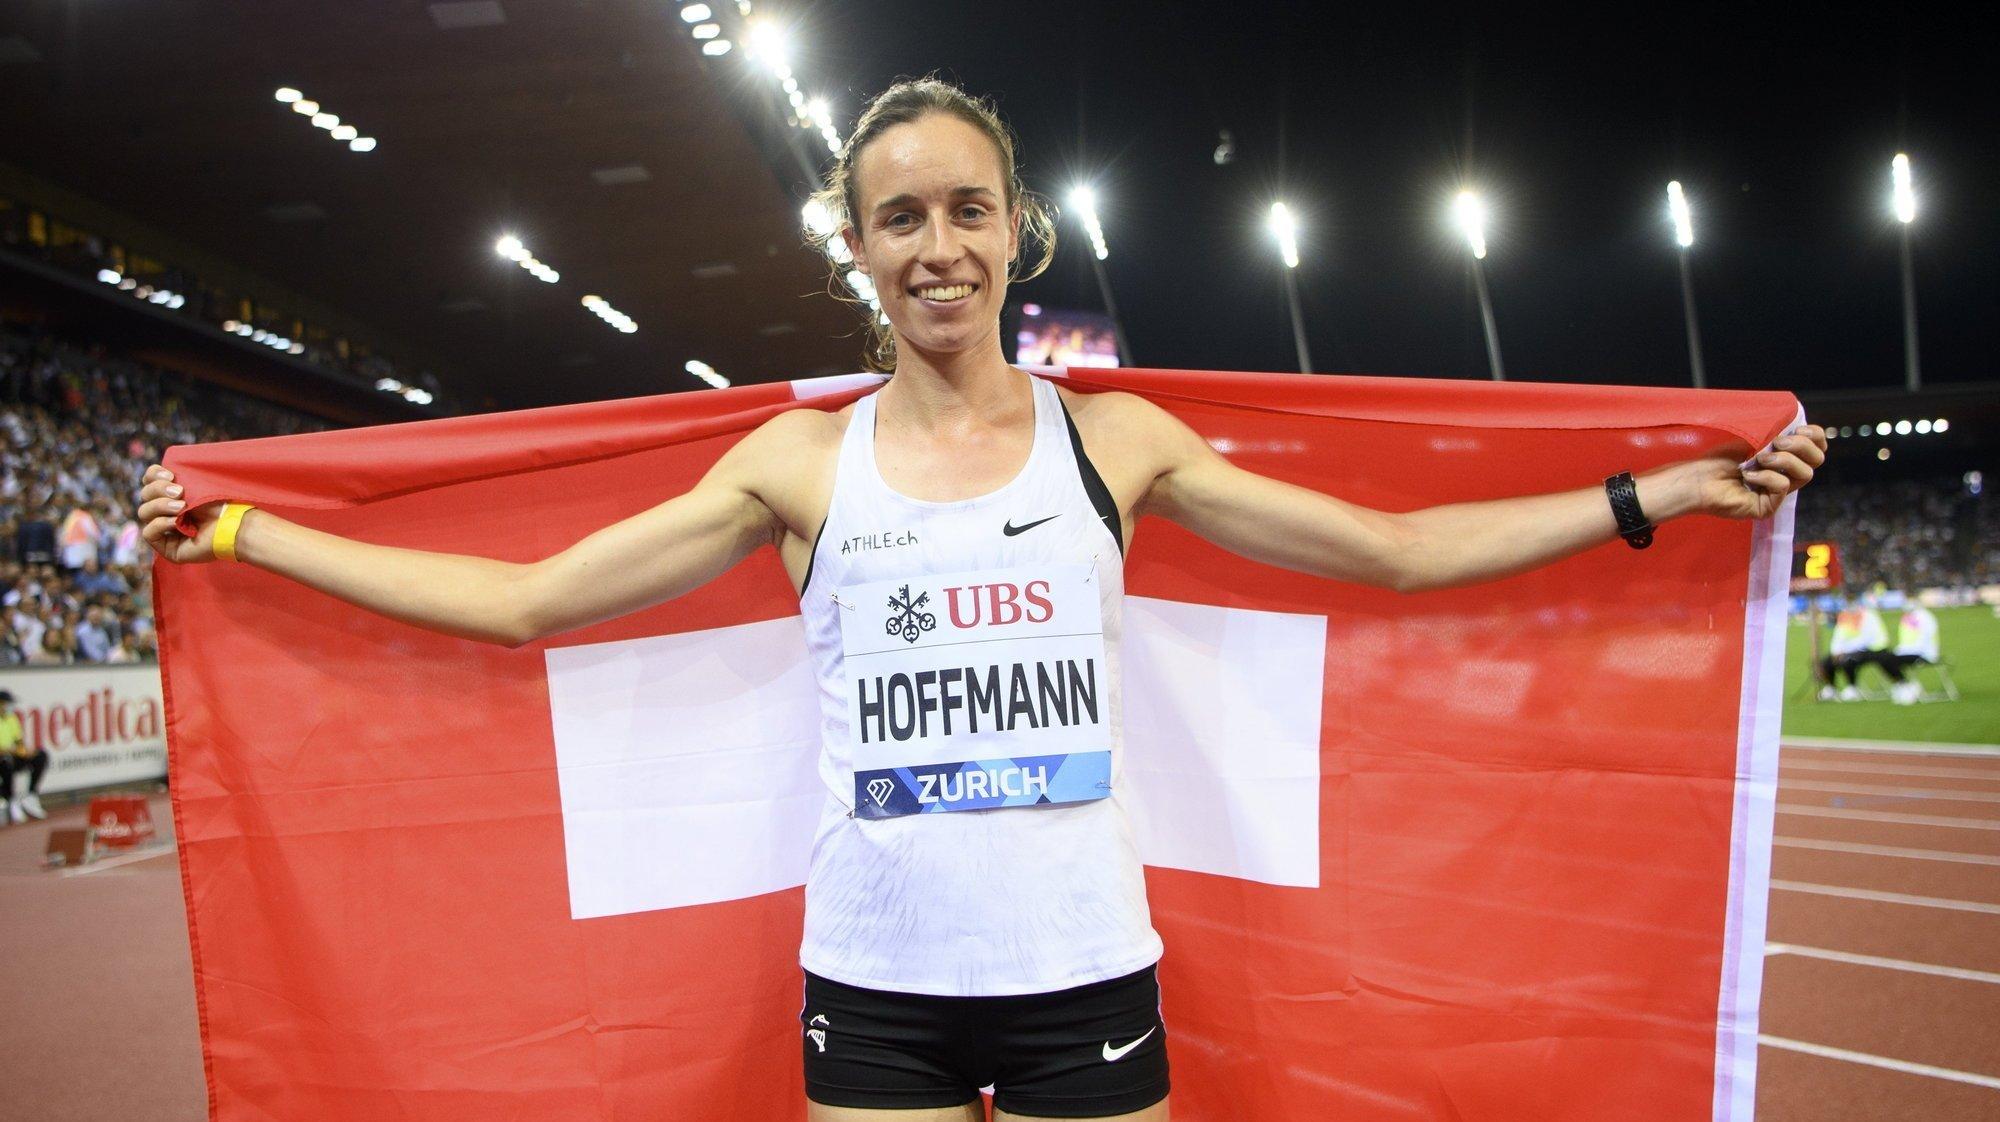 Athlétisme – Lore Hoffmann: «Je ne comprends pas»